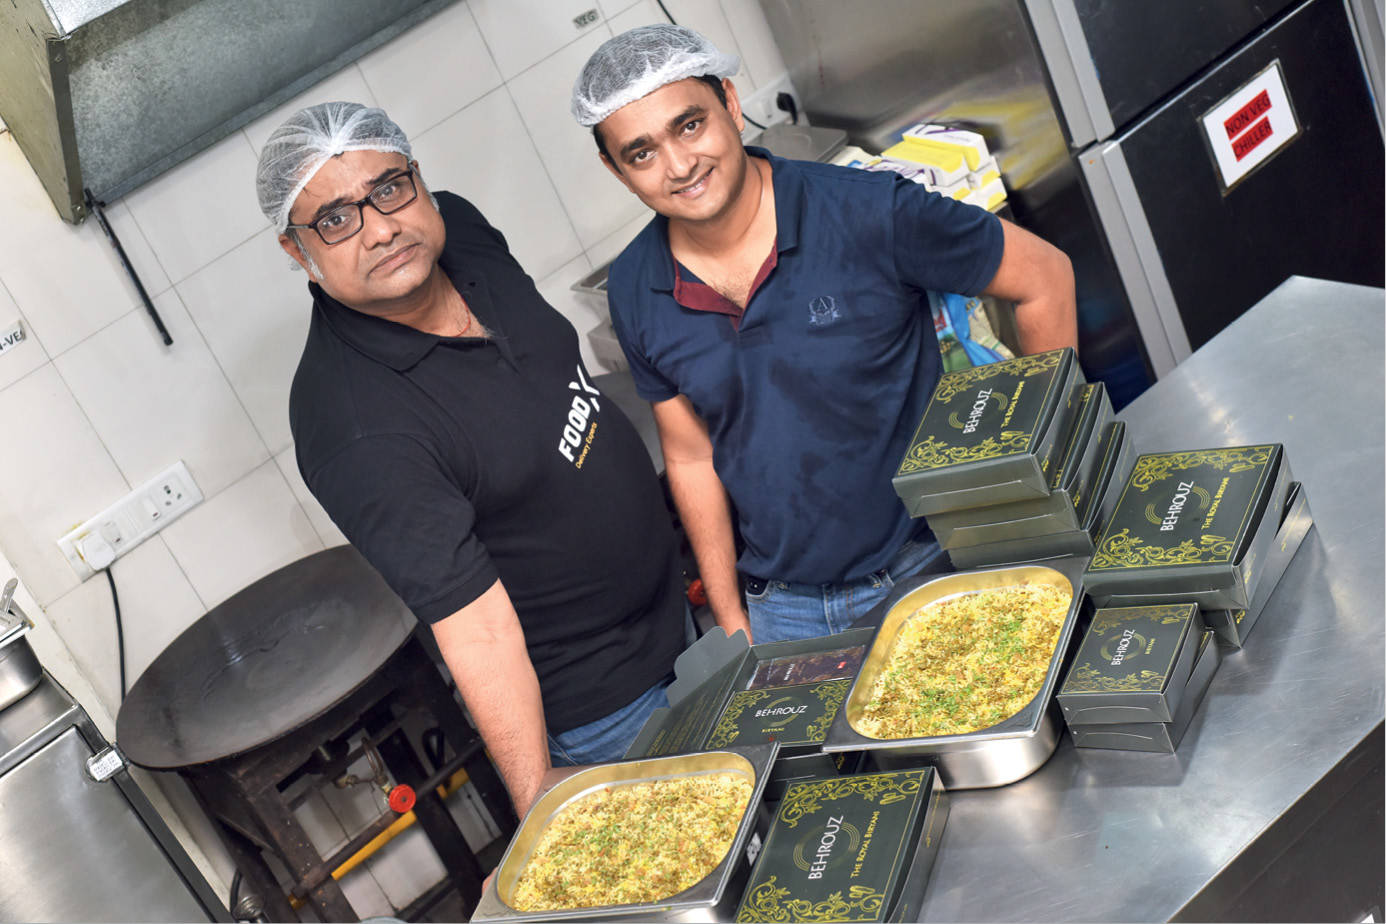 Проект Faasos. Фото с сайта brandequity.economictimes.indiatimes.com